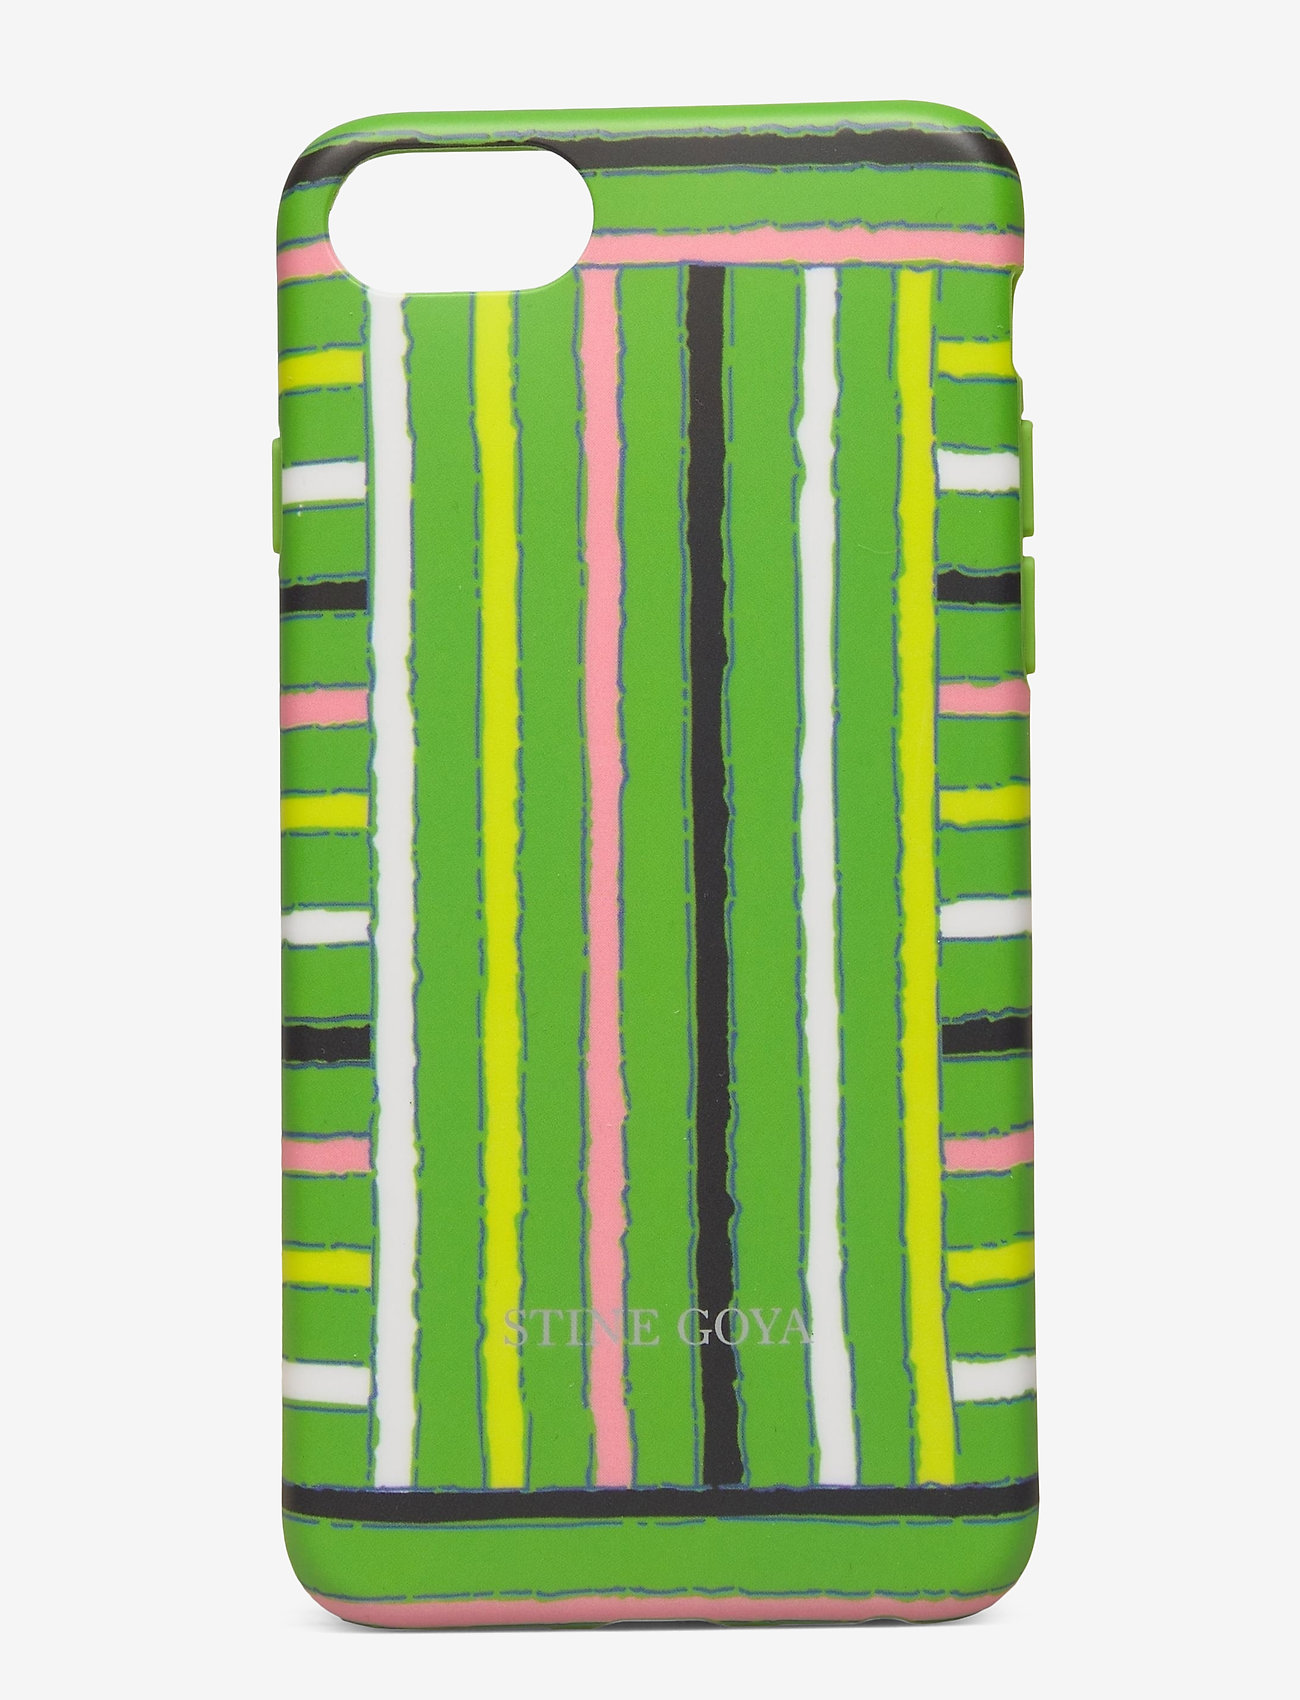 STINE GOYA - Molly, Iphone Cover 6/7/8 - mobilskal - stripes green - 0